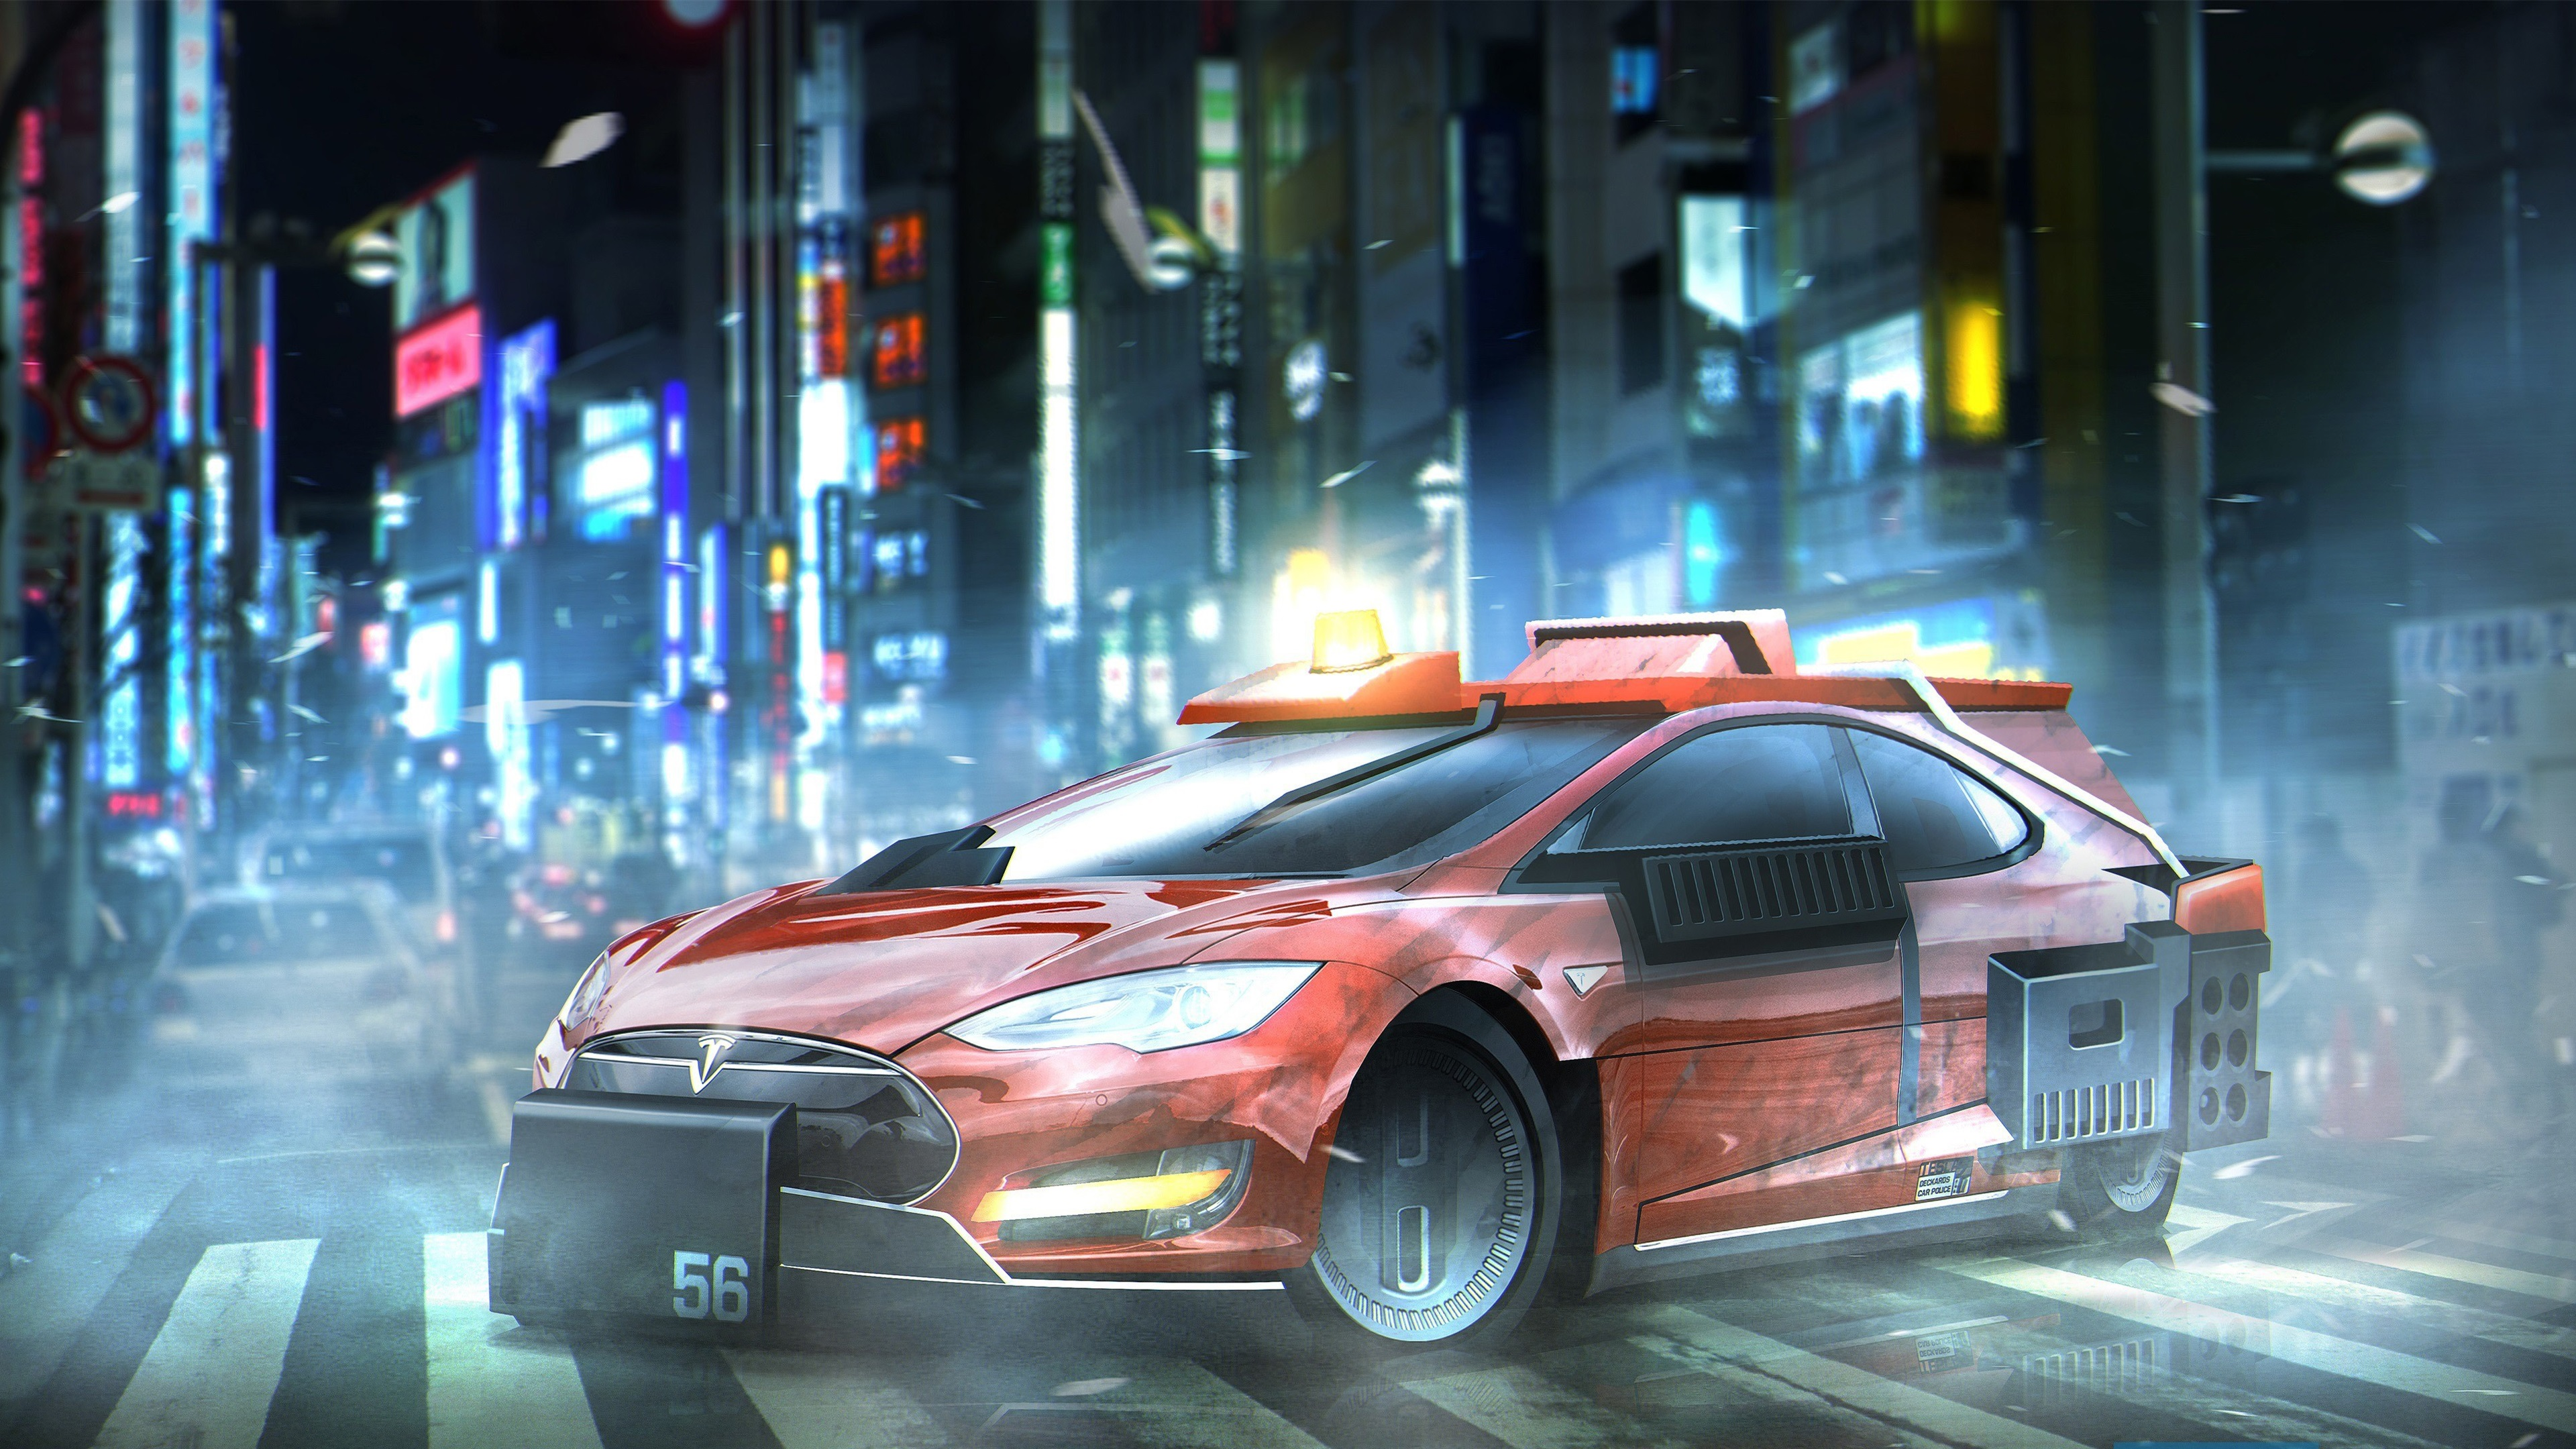 Wallpaper Blade Runner 2049 Tesla Model S Car 3840x2160 Uhd 4k